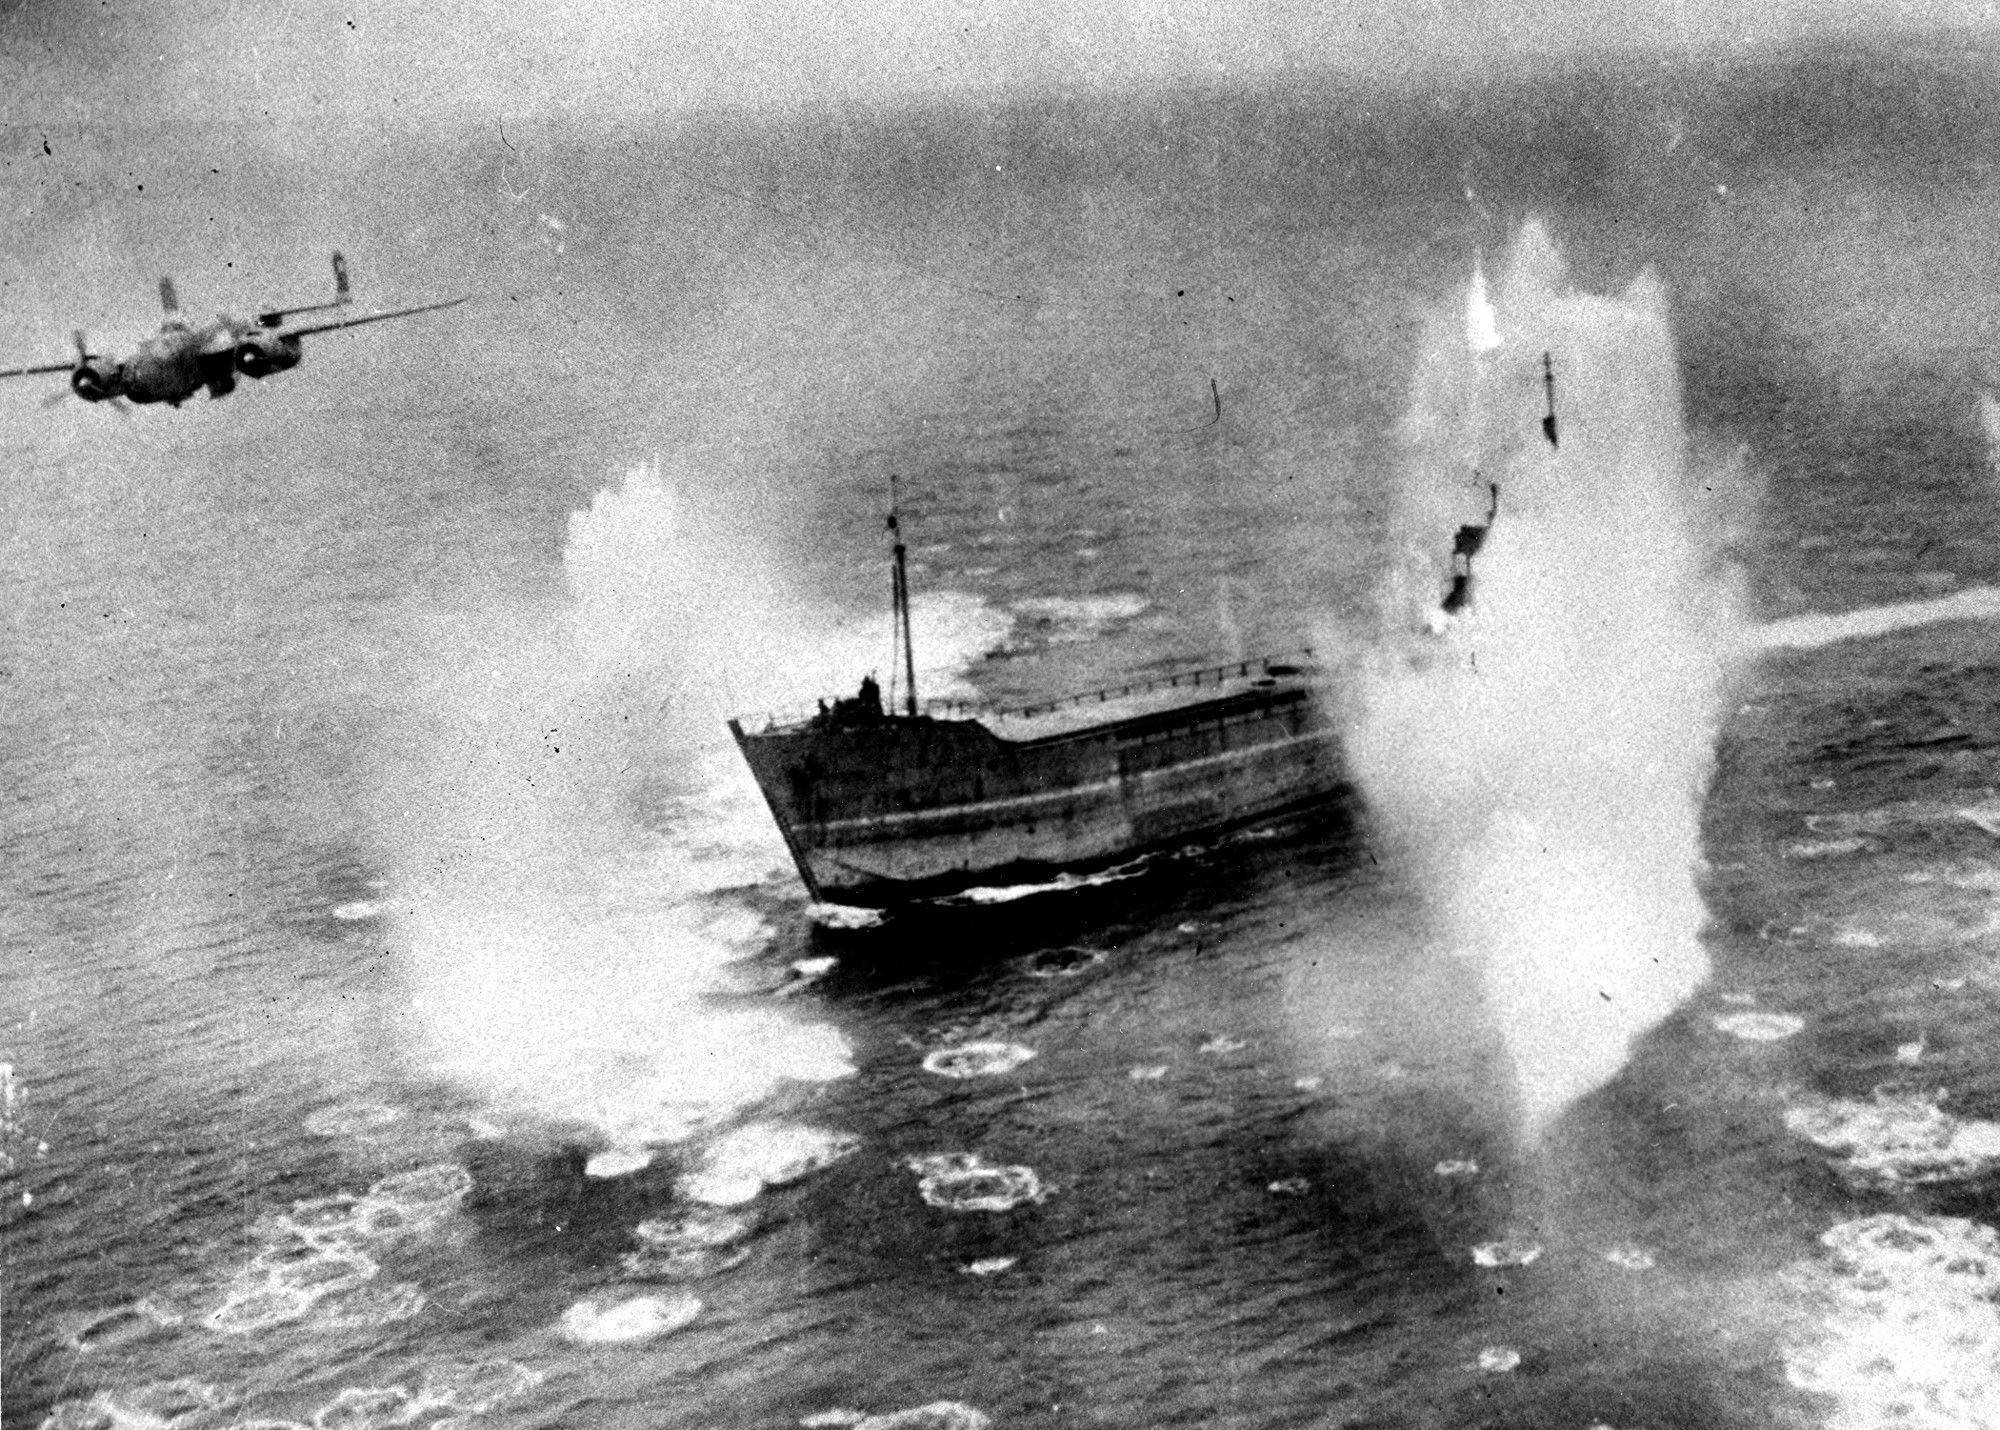 b25-skip-bombing-tanker842-5x7.jpg